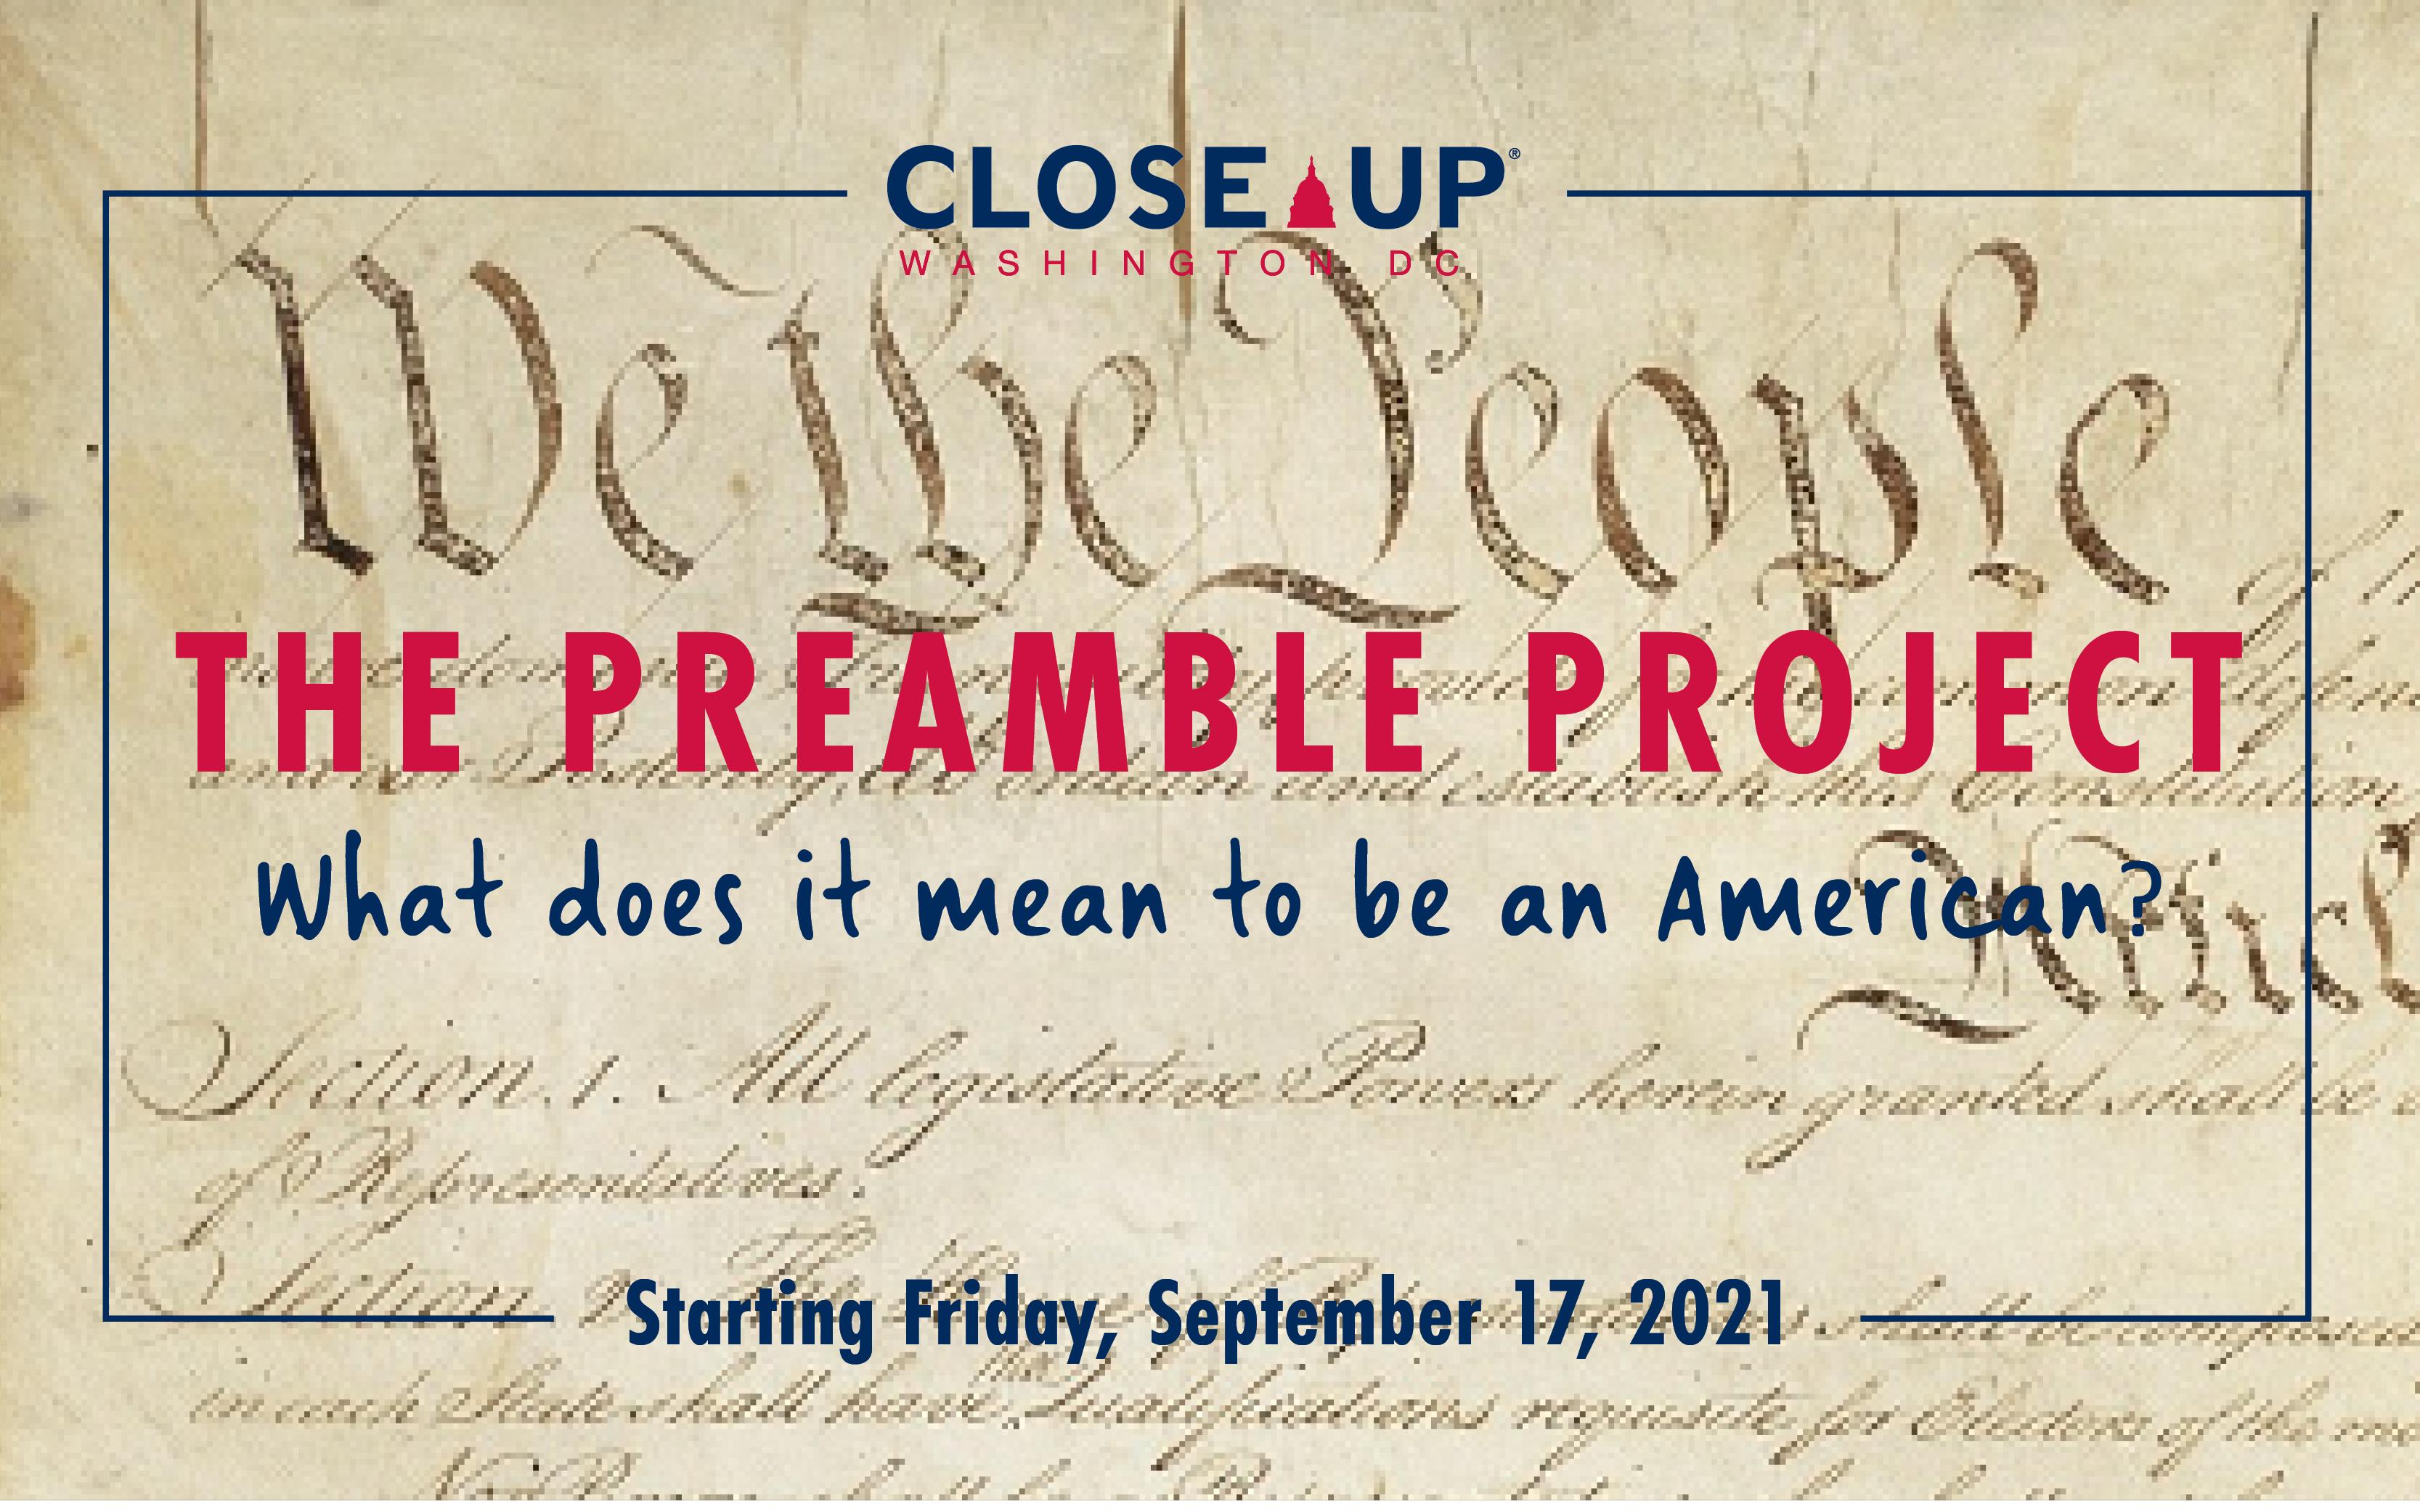 Preamble Project